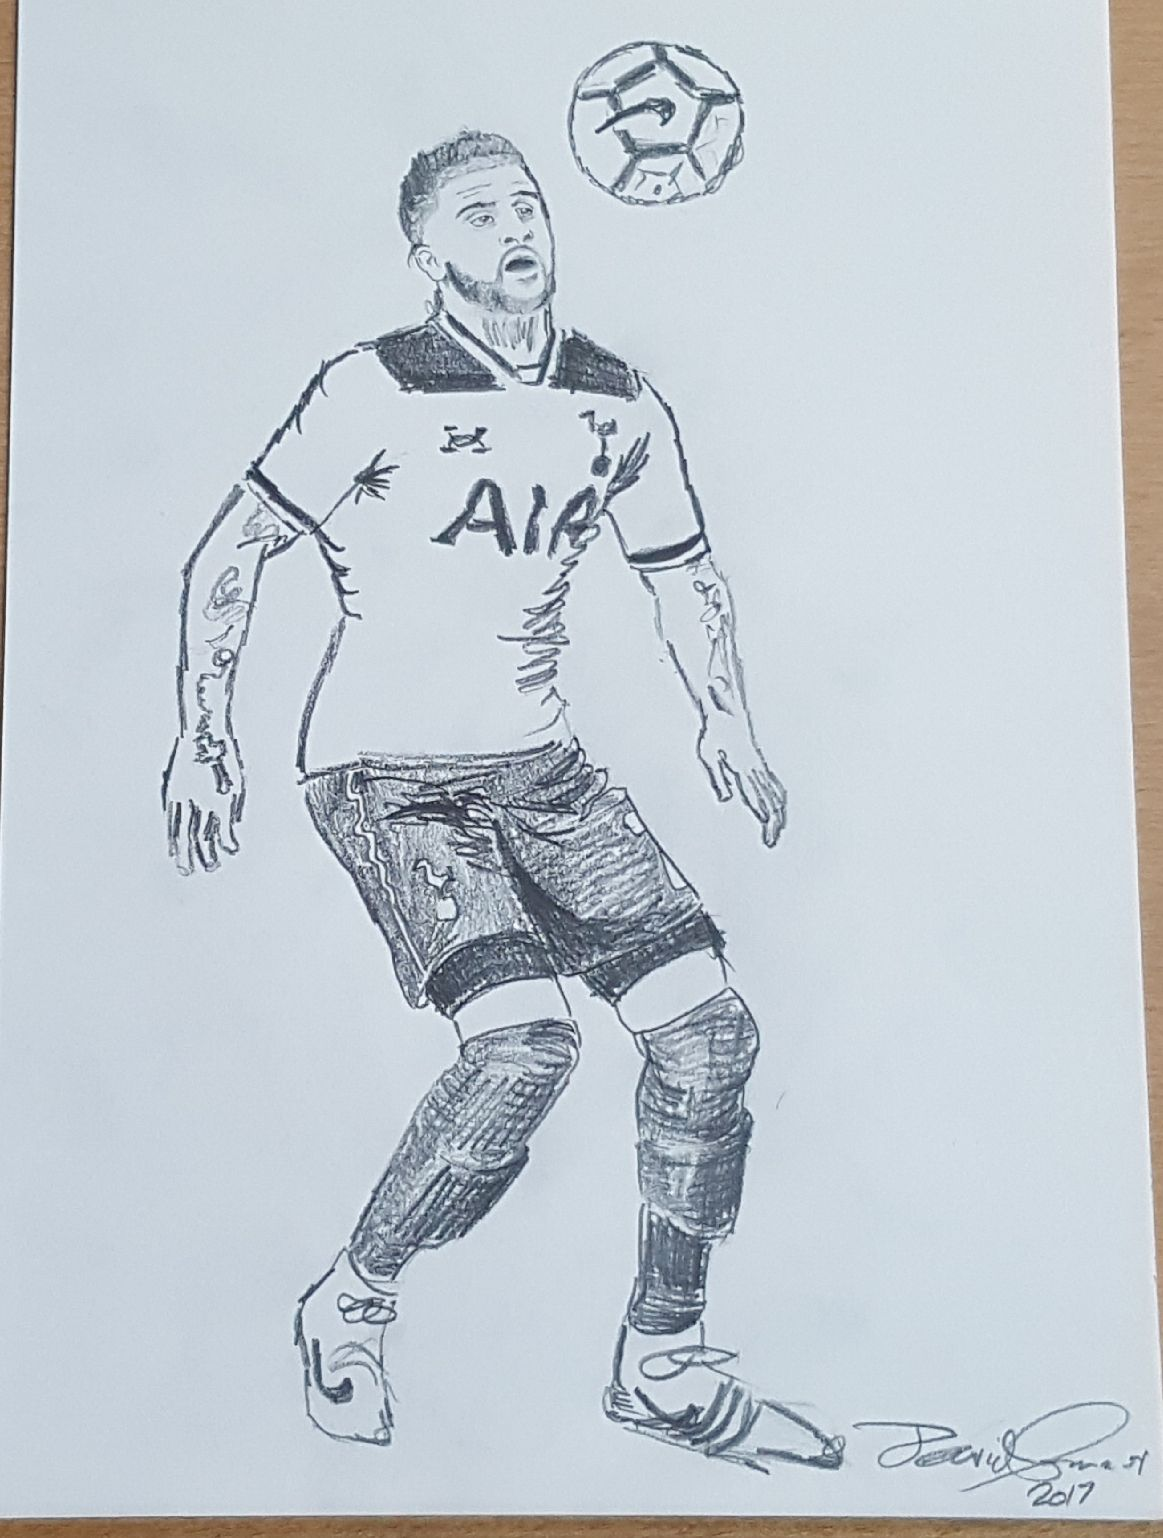 1163x1538 A Footballer By David Connor. An Original Pencil Drawing By David